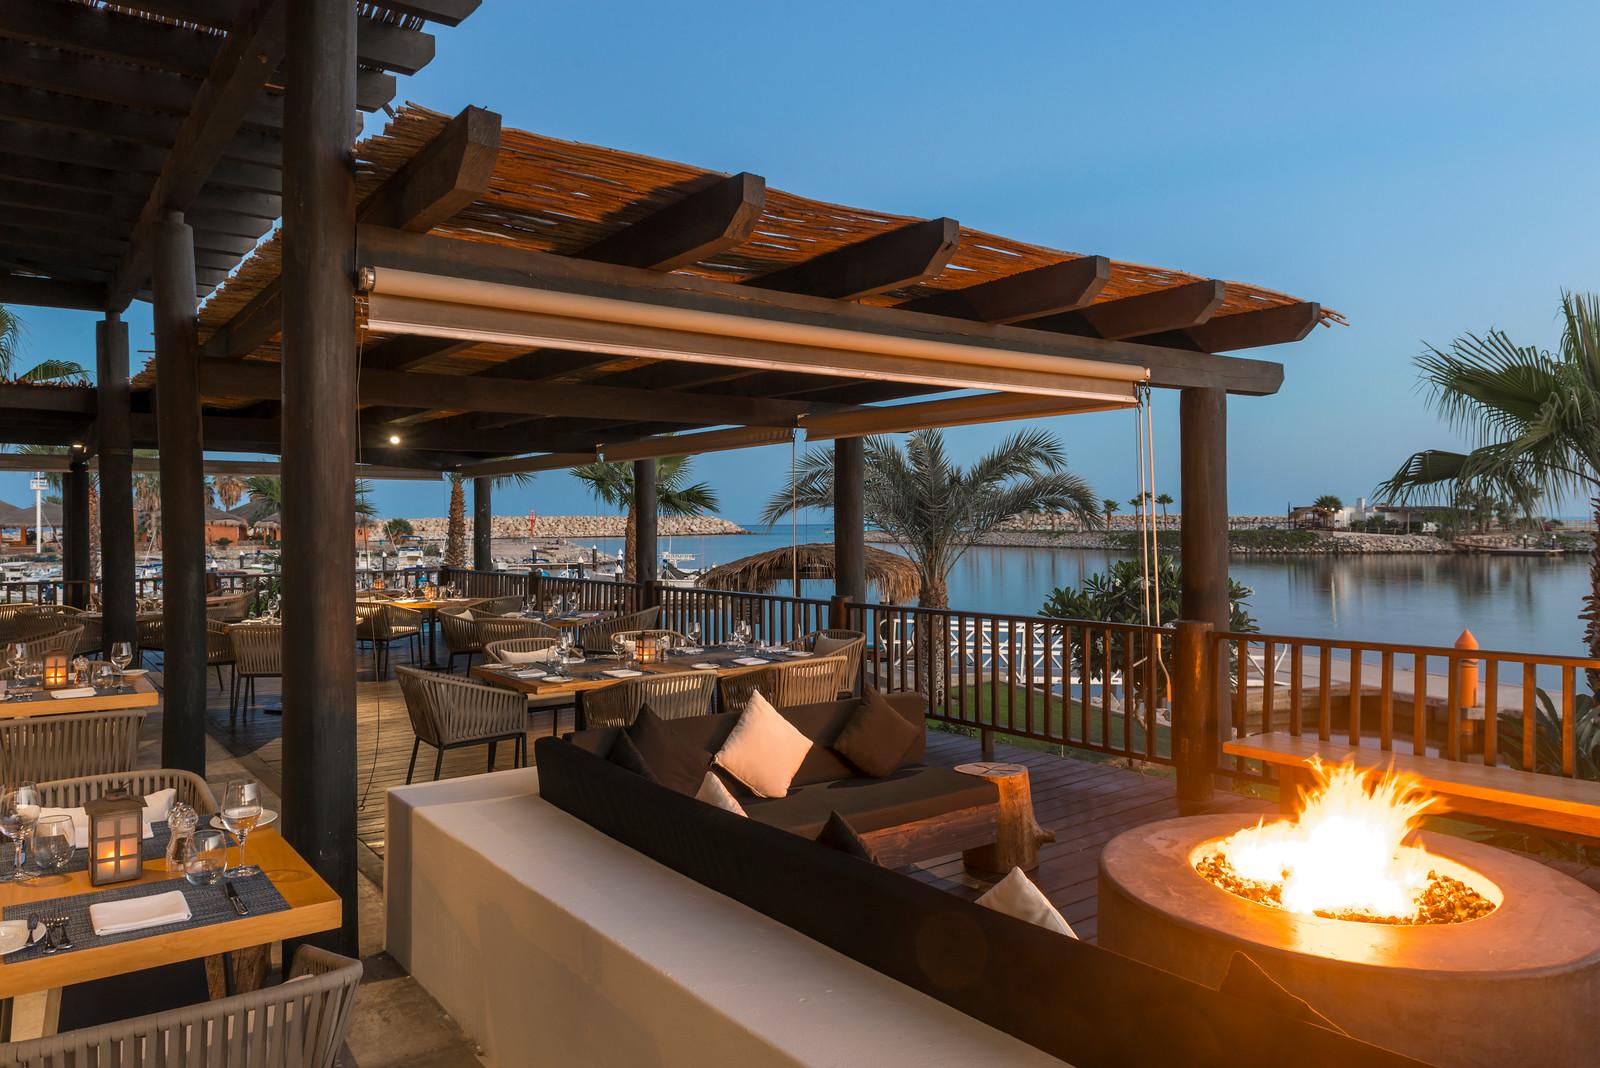 Enjoy a Lovely Dinner on the Terrace. Photo Courtesy of Hotel El Ganzo